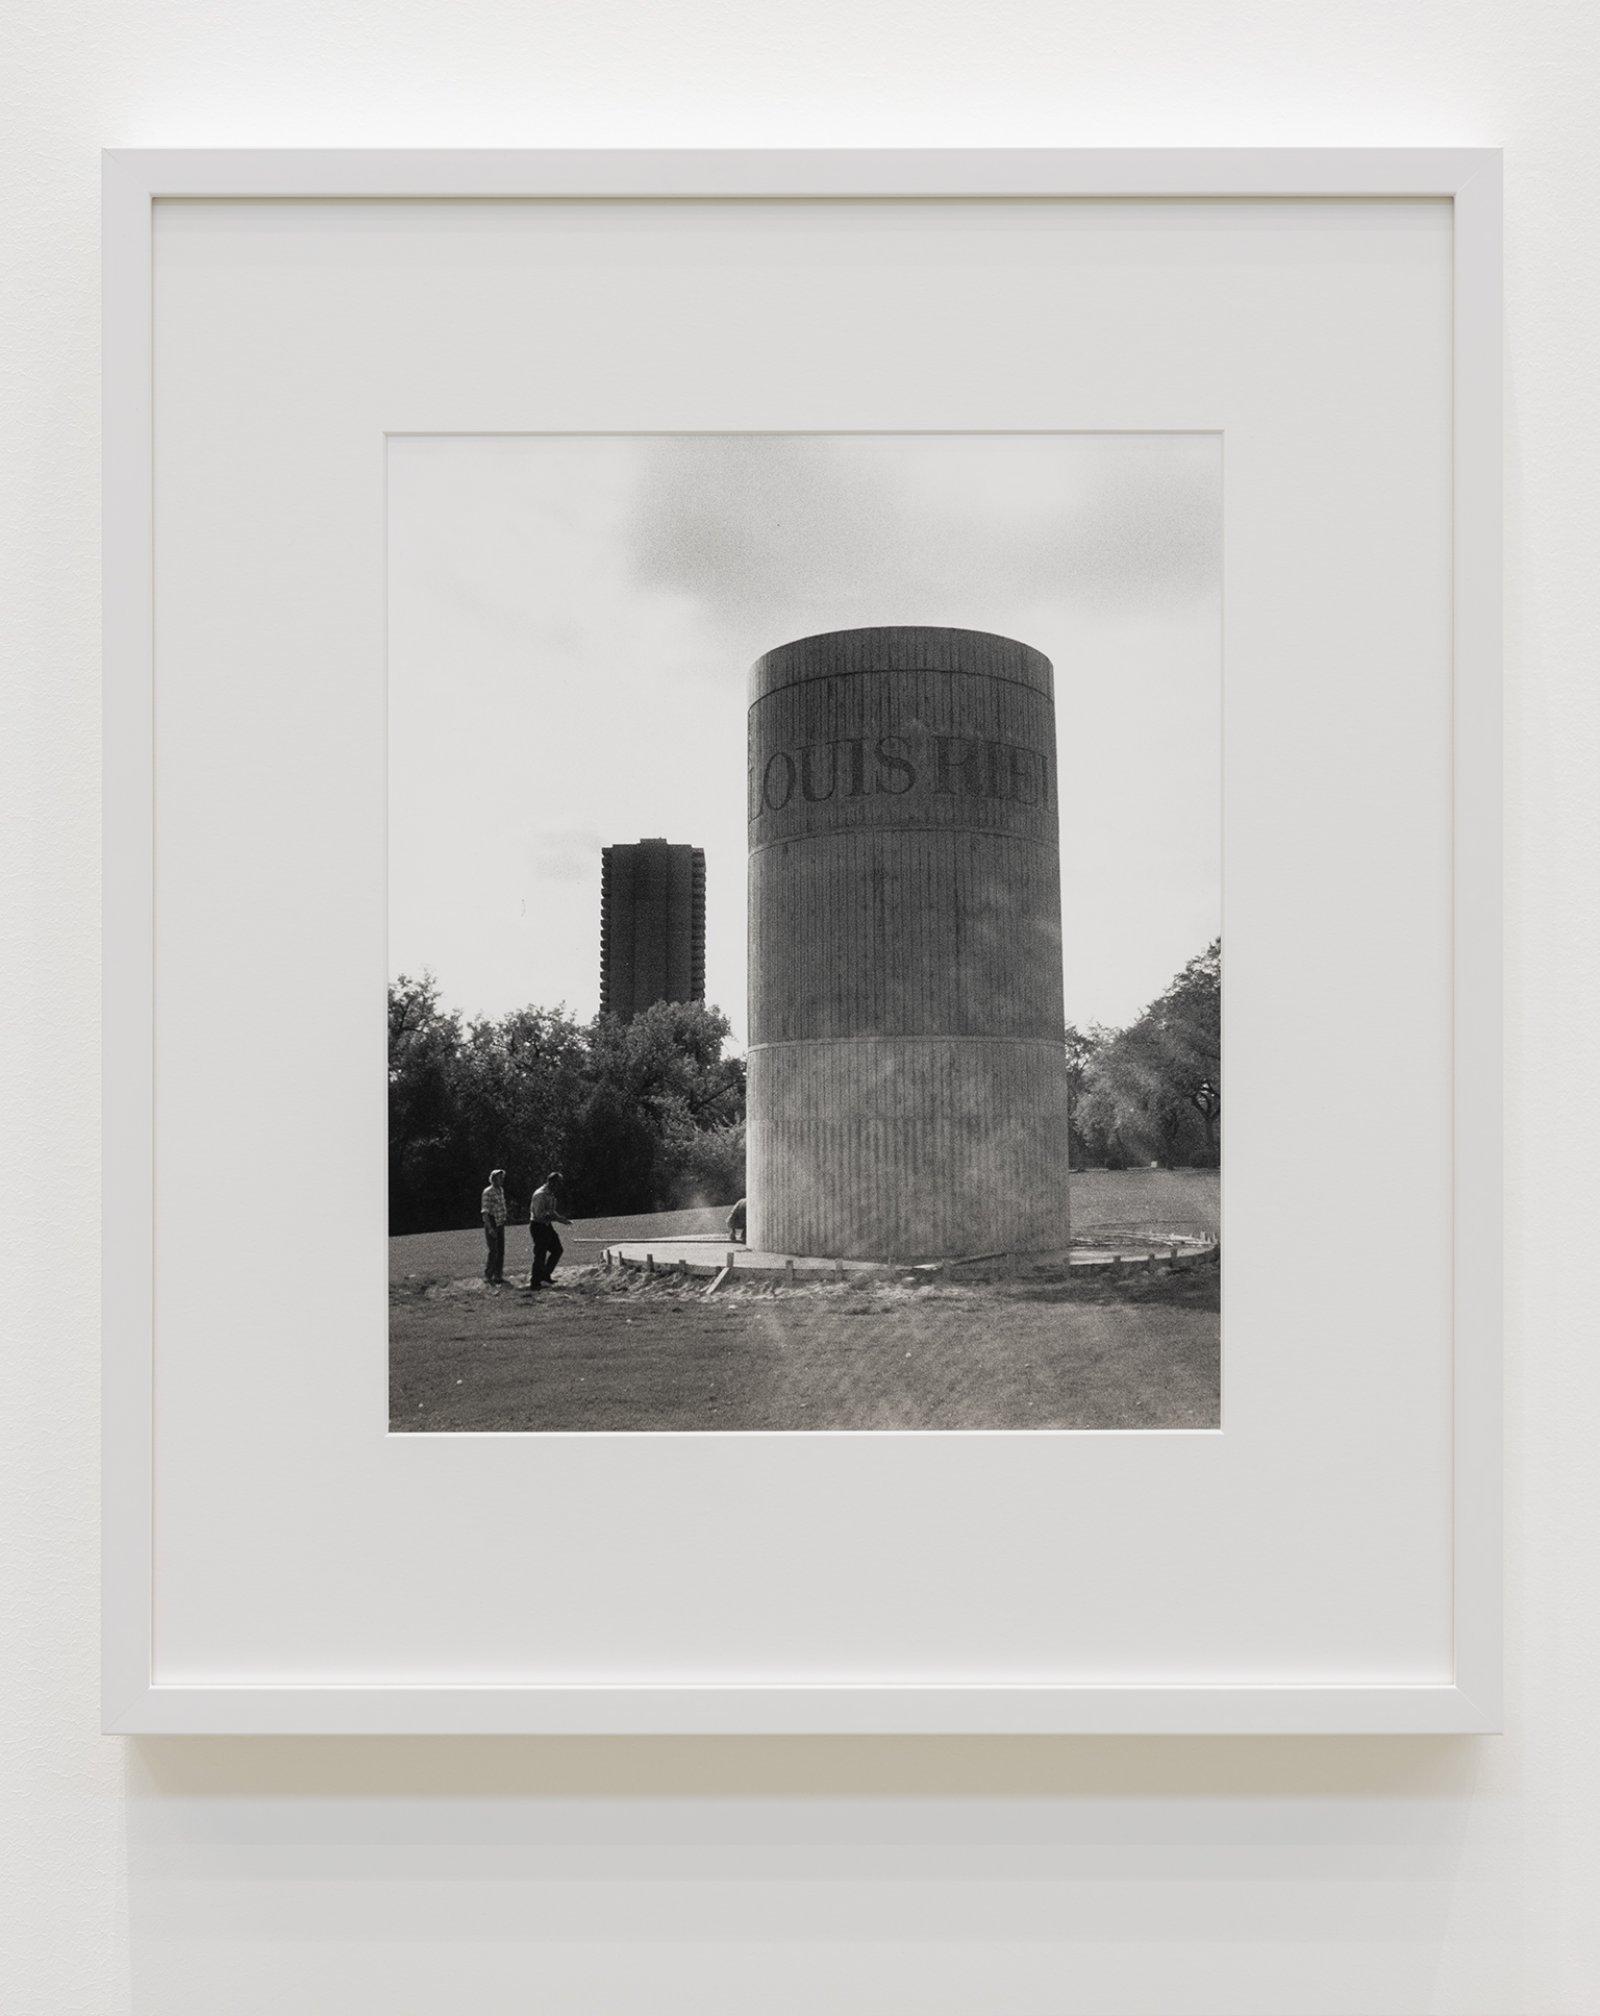 Ian Wallace, Monument to Louis Riel, 1972, silver gelatin print, 20 x 18 in. (50 x 44 cm)